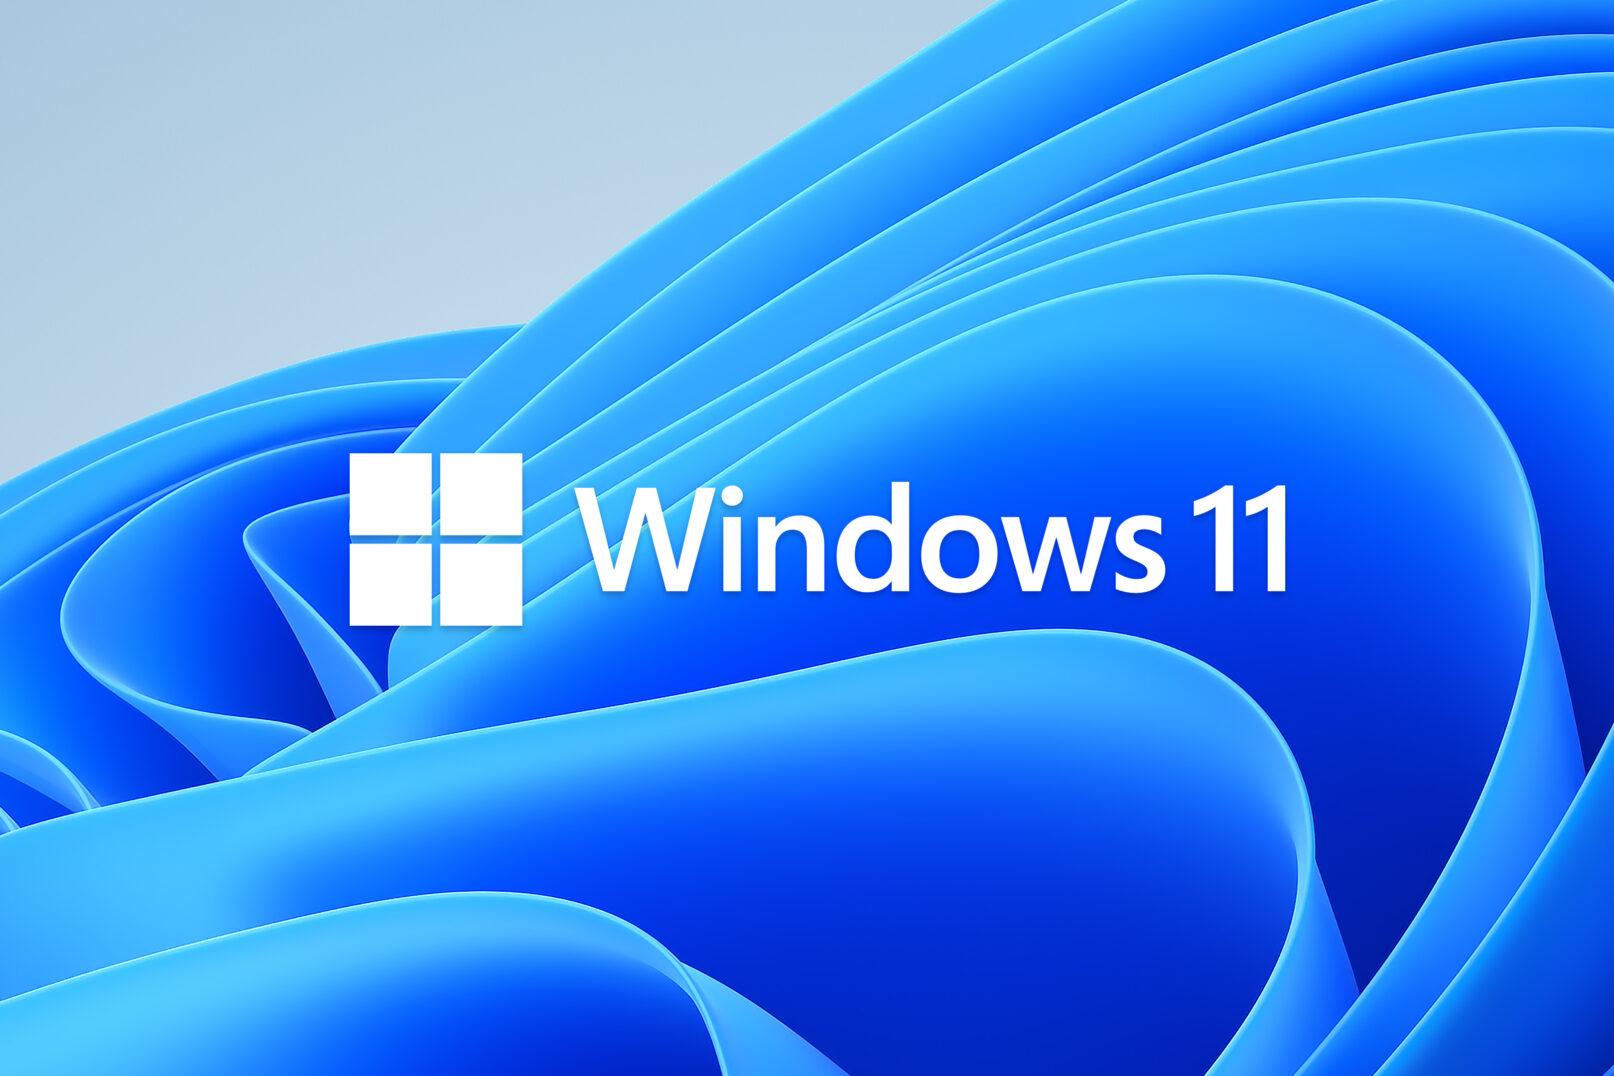 Windows 11 Featured Image